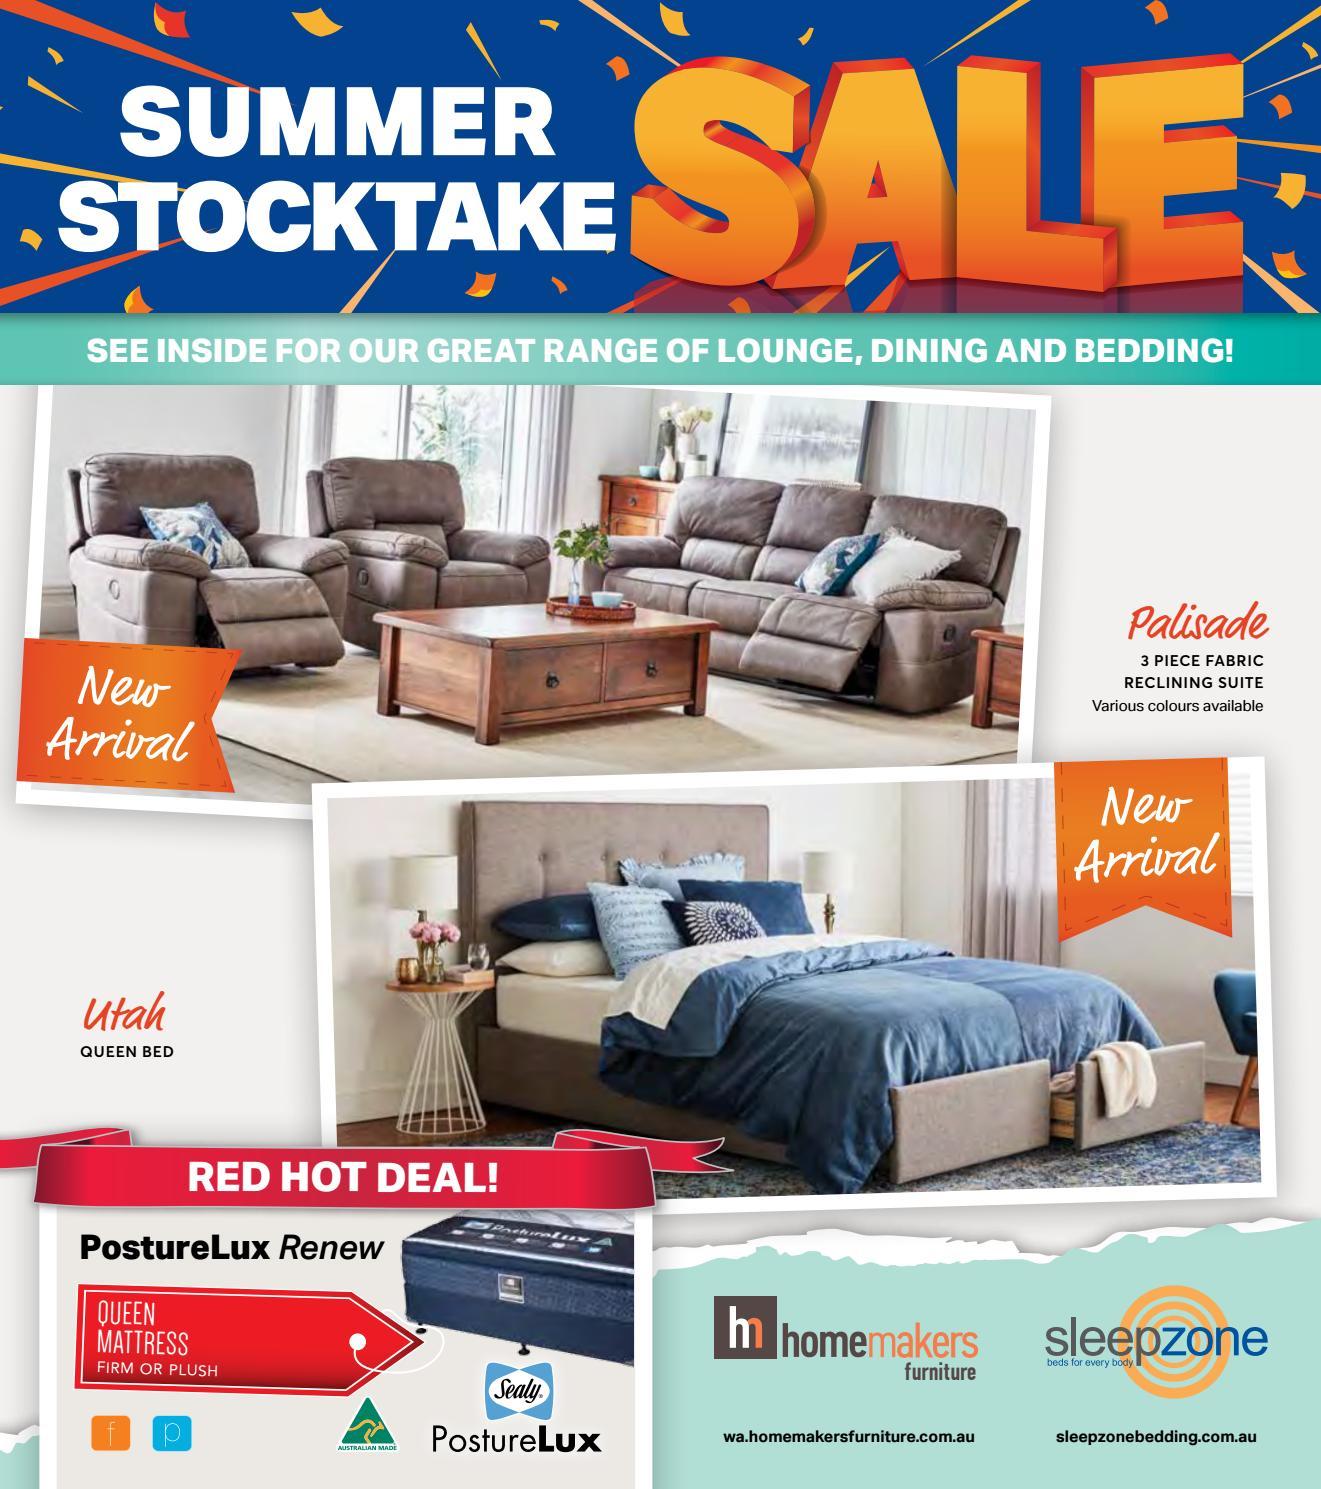 Homemakers Sleepzone Summer Stocktake Sale CatalogueNov16 by